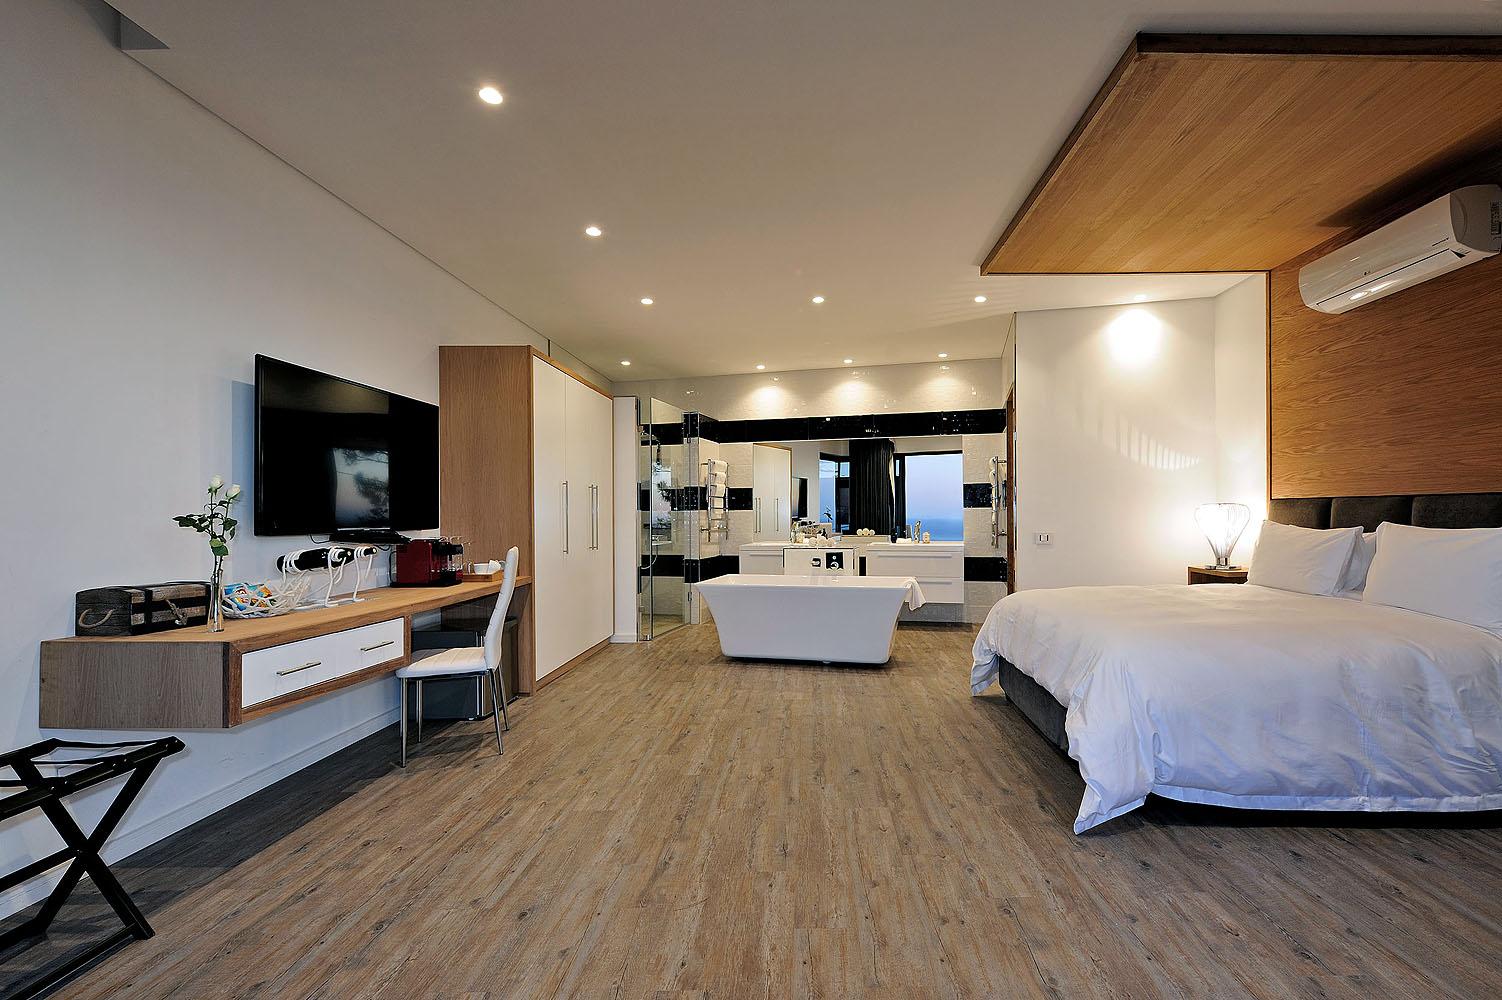 Sea Star Rock Lodge - Pool Room